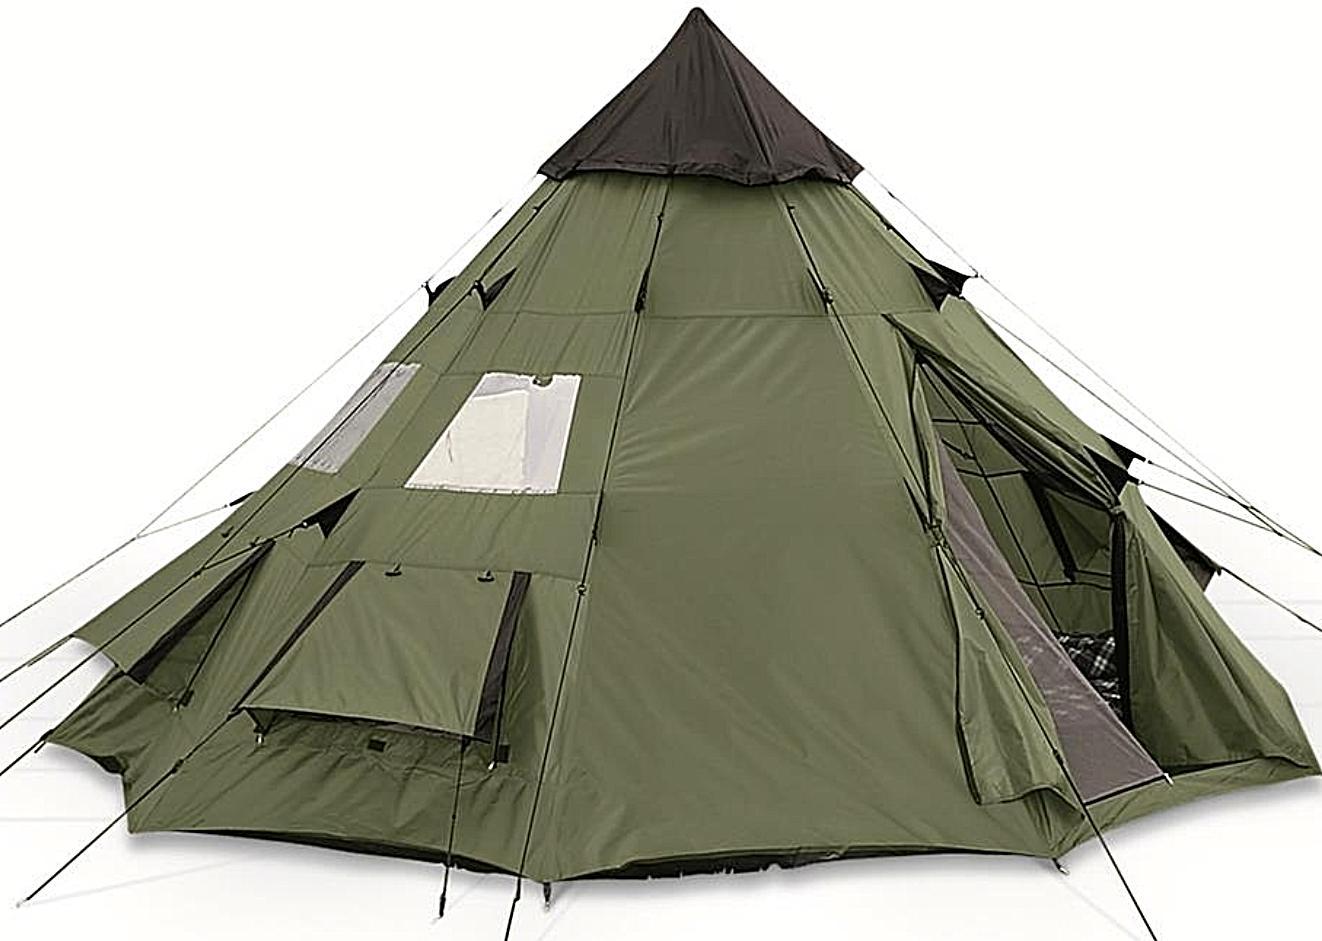 family teepee tent 10x10 sleeps 6 people